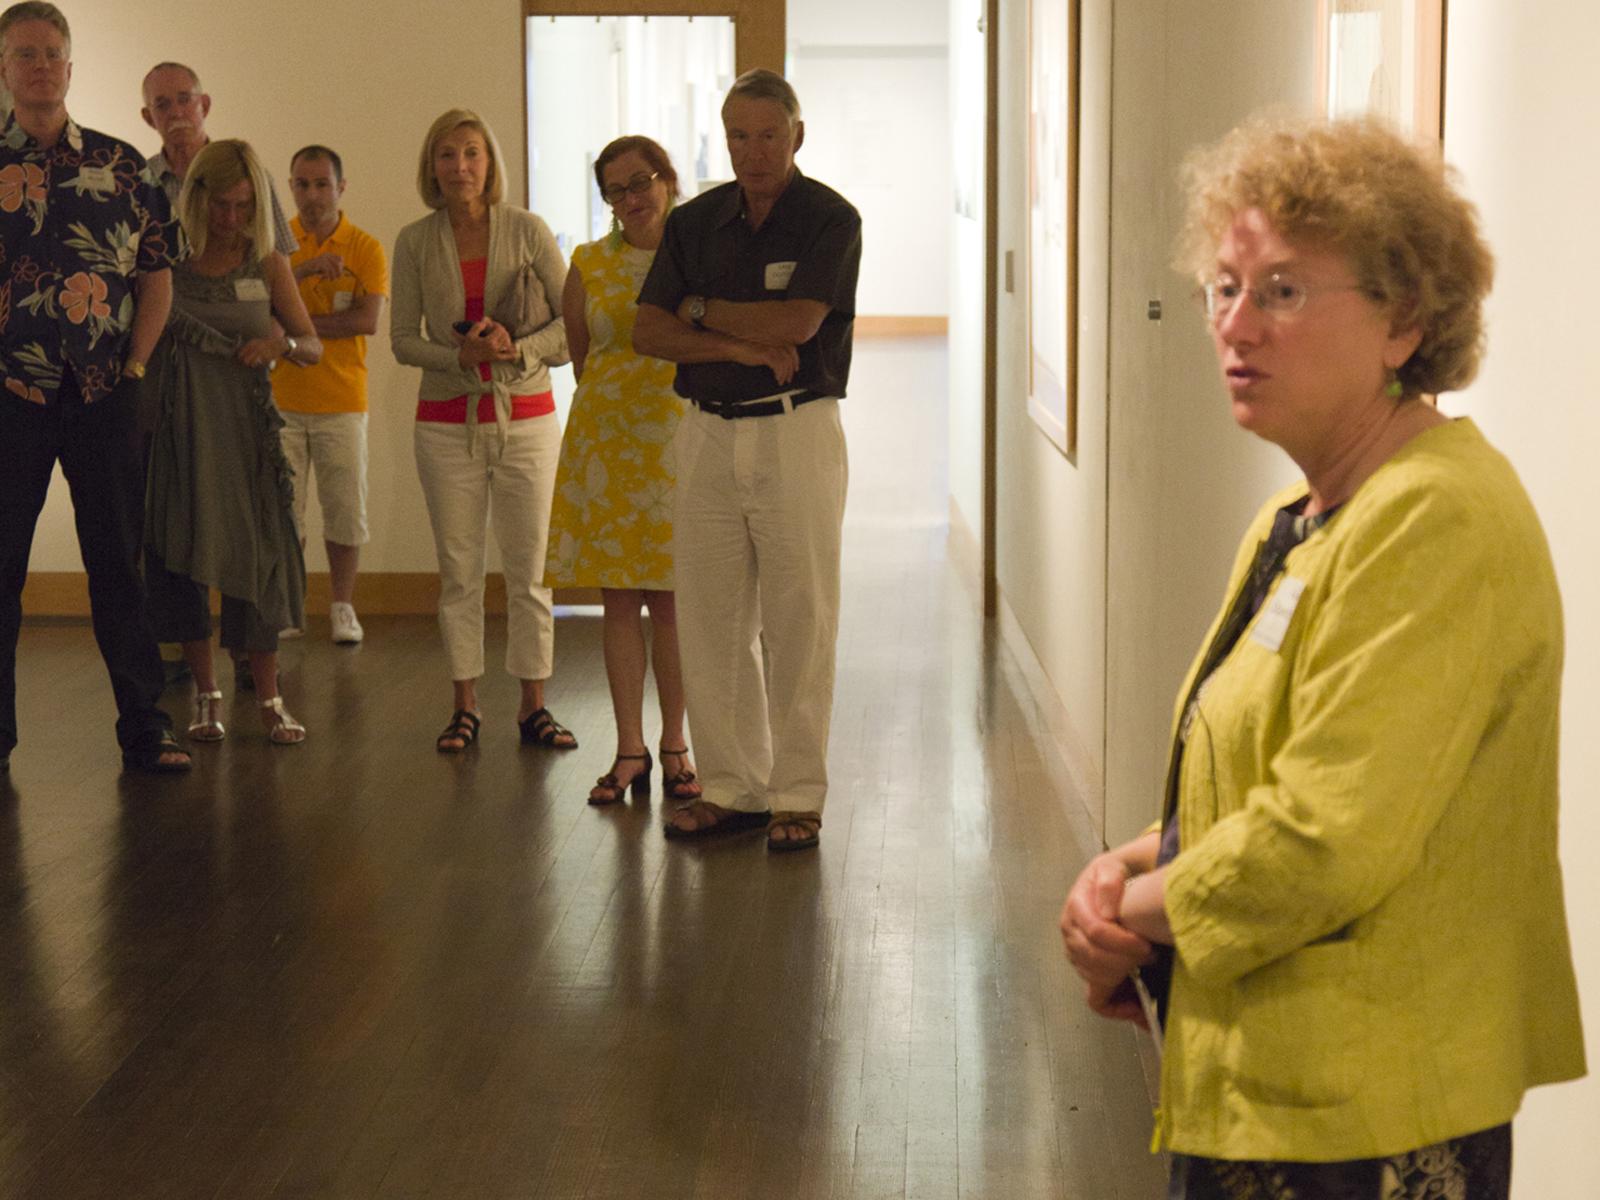 PAAM Circle event Gail Levin, Phyllis Goldman, Terry Keane,